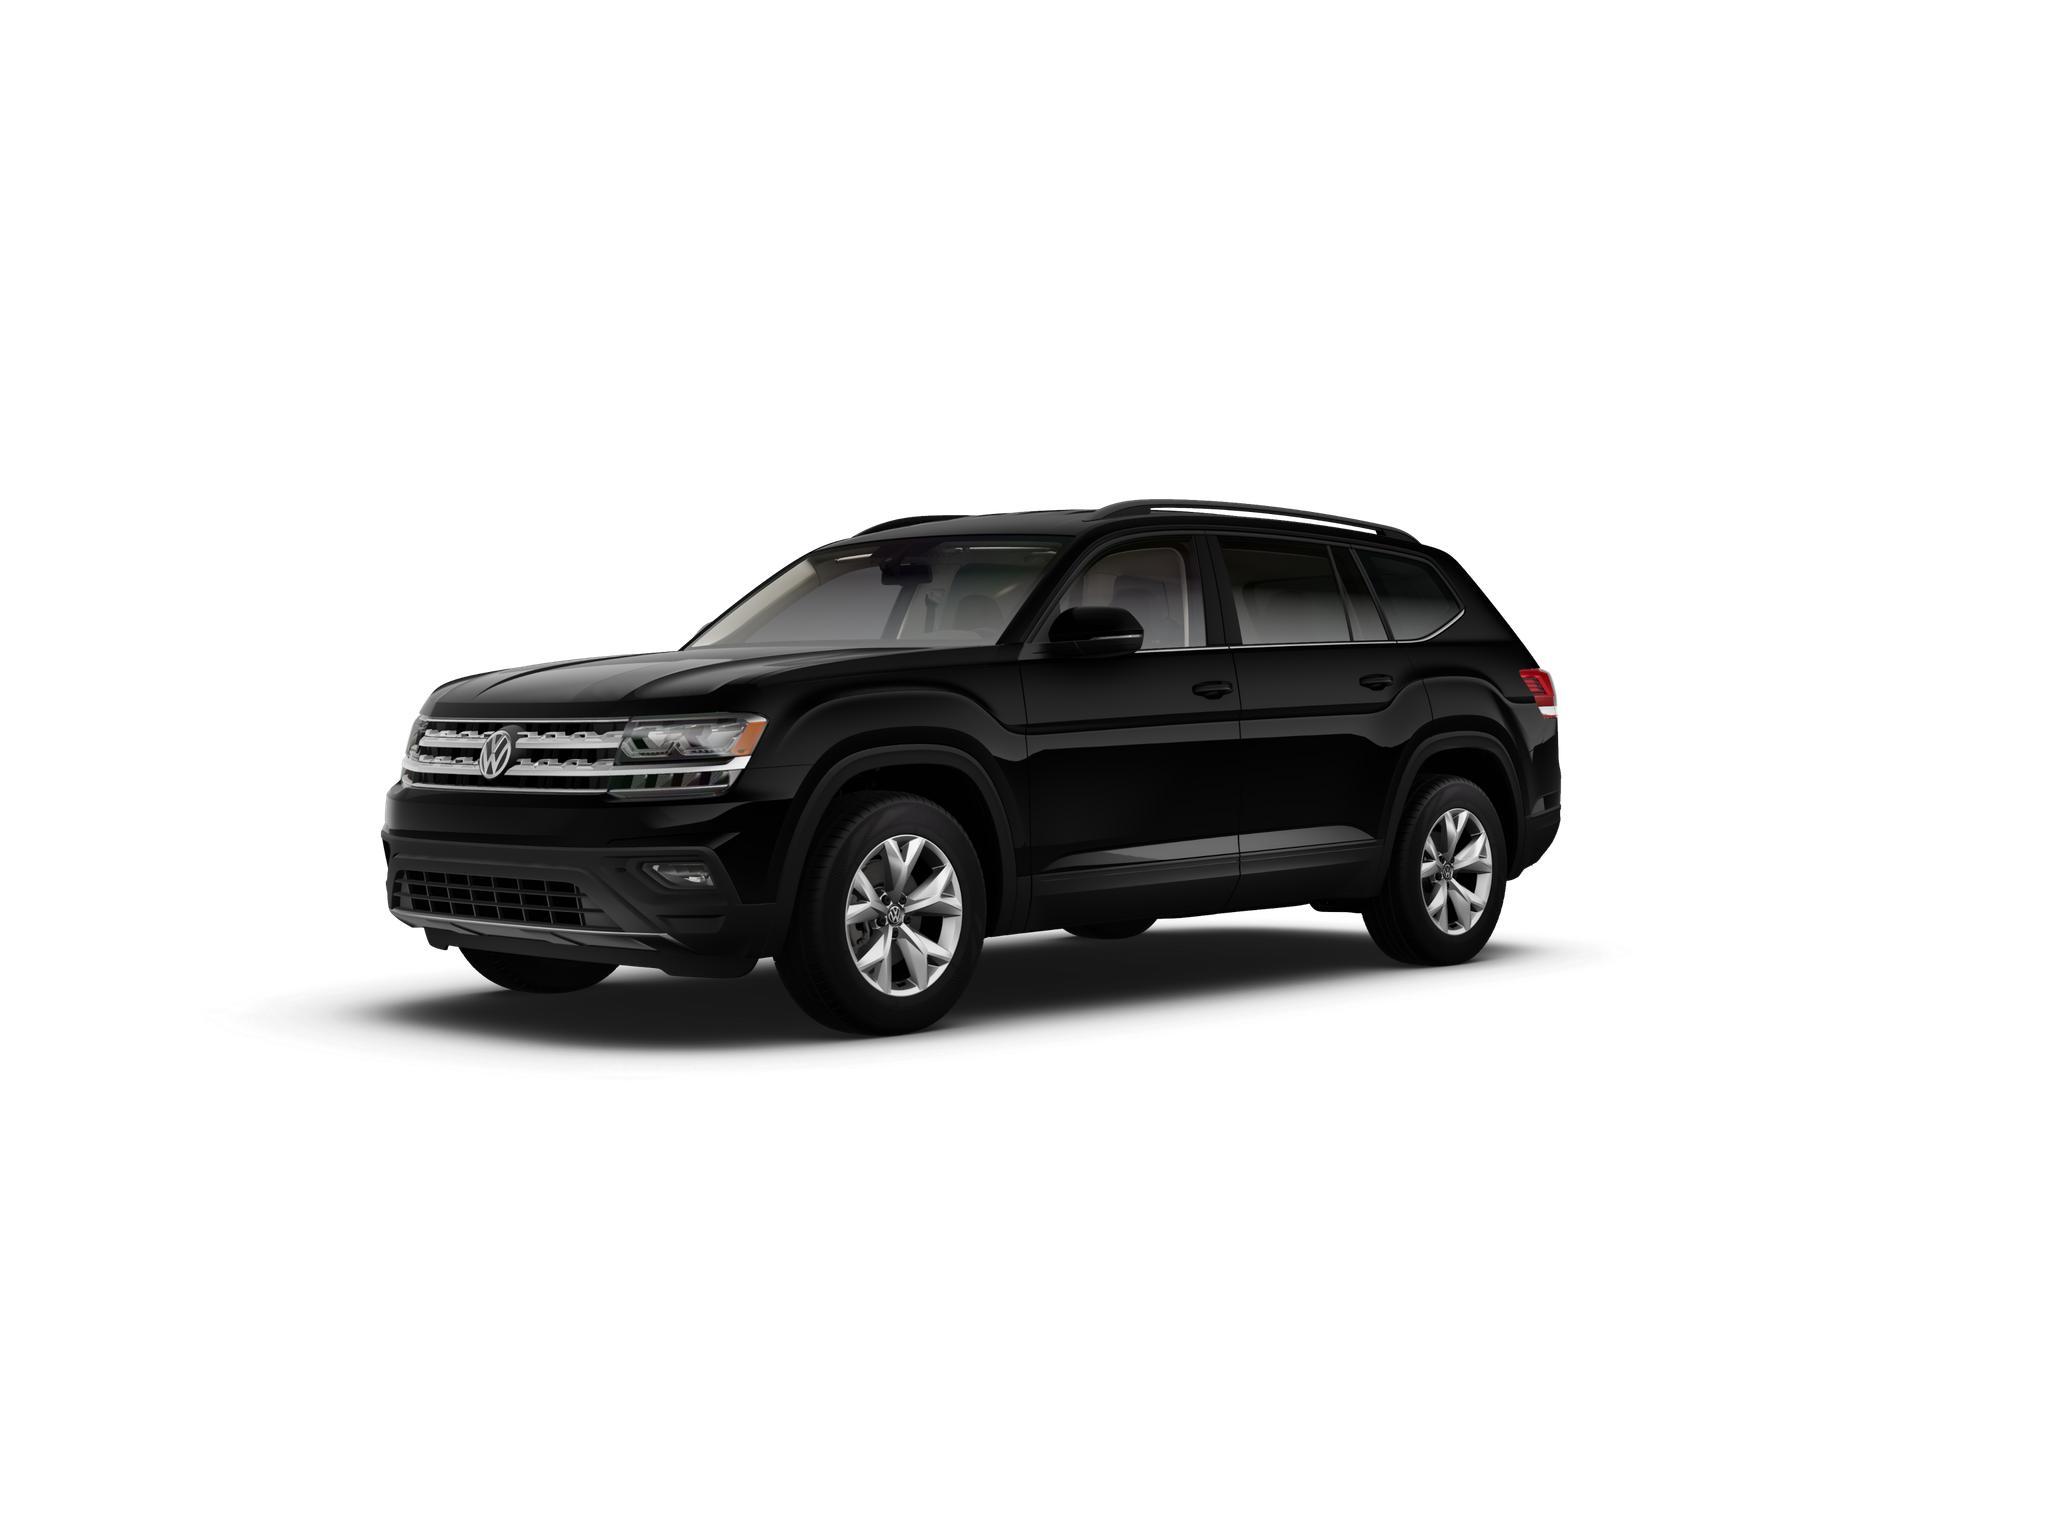 Volkswagen Teramont Внедорожник (Respect)